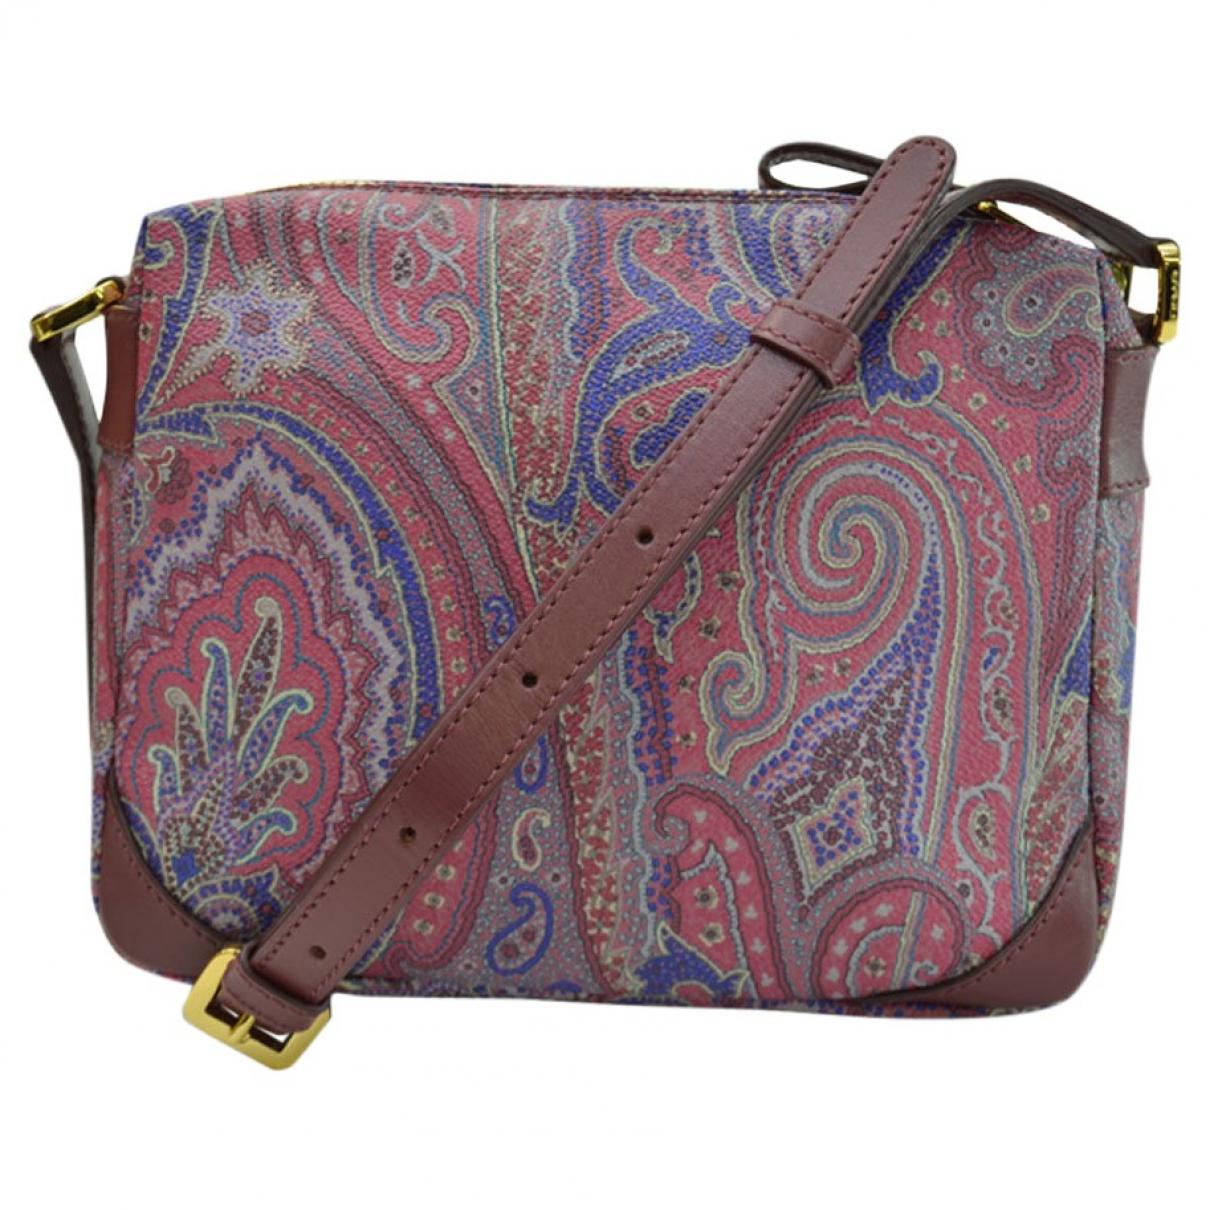 Etro \N Handtasche in  Bordeauxrot Leinen